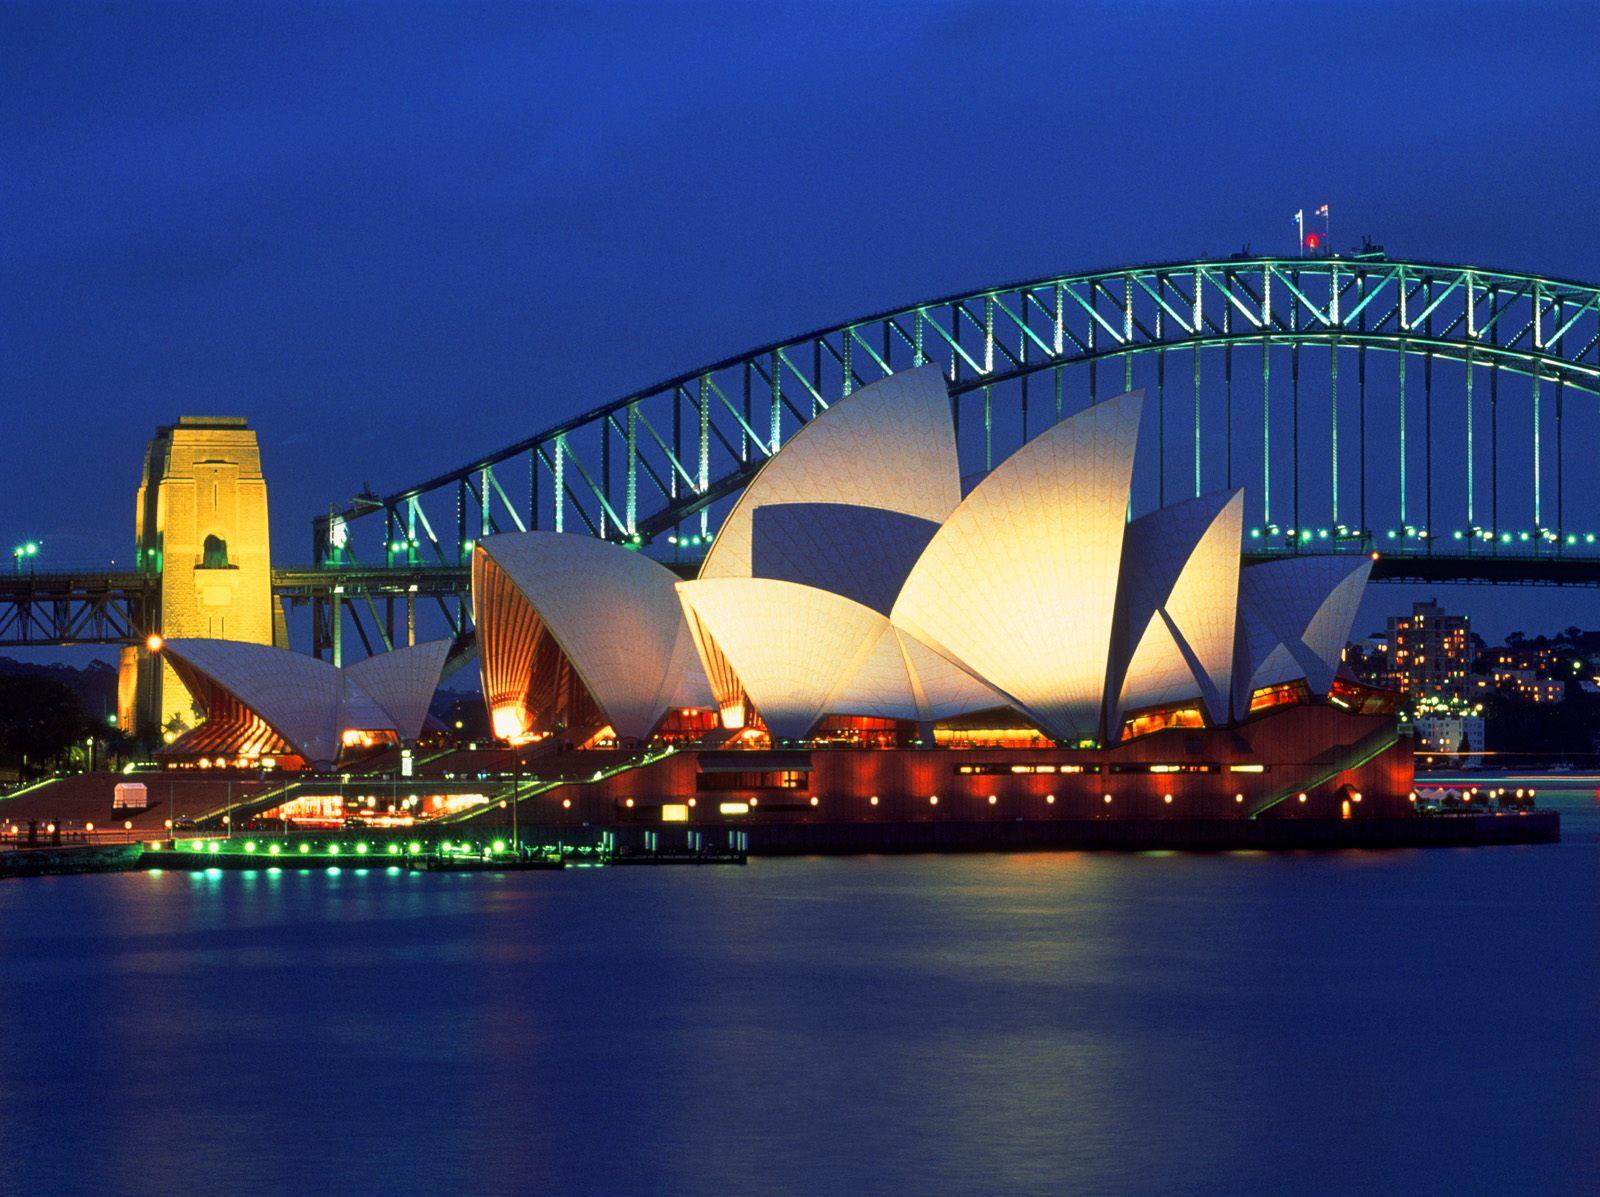 Sydney opera house 08 - Download Images Of Sydney Opera House  Background